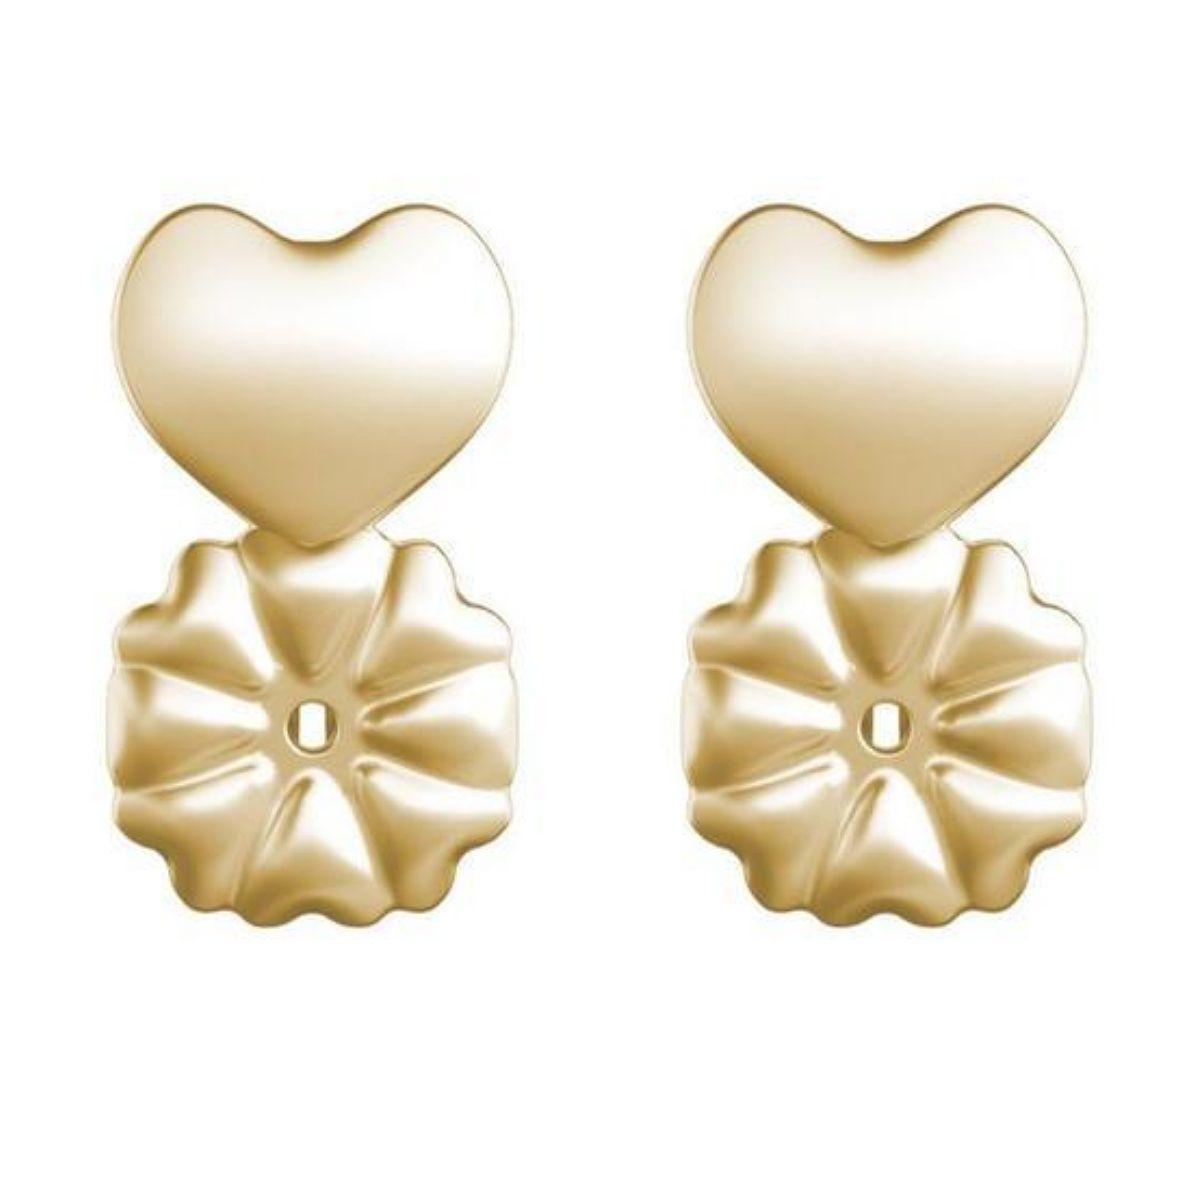 Ear Cuff Turquesa Palito Zircônias Semijoia Fashion Ouro  - Soloyou